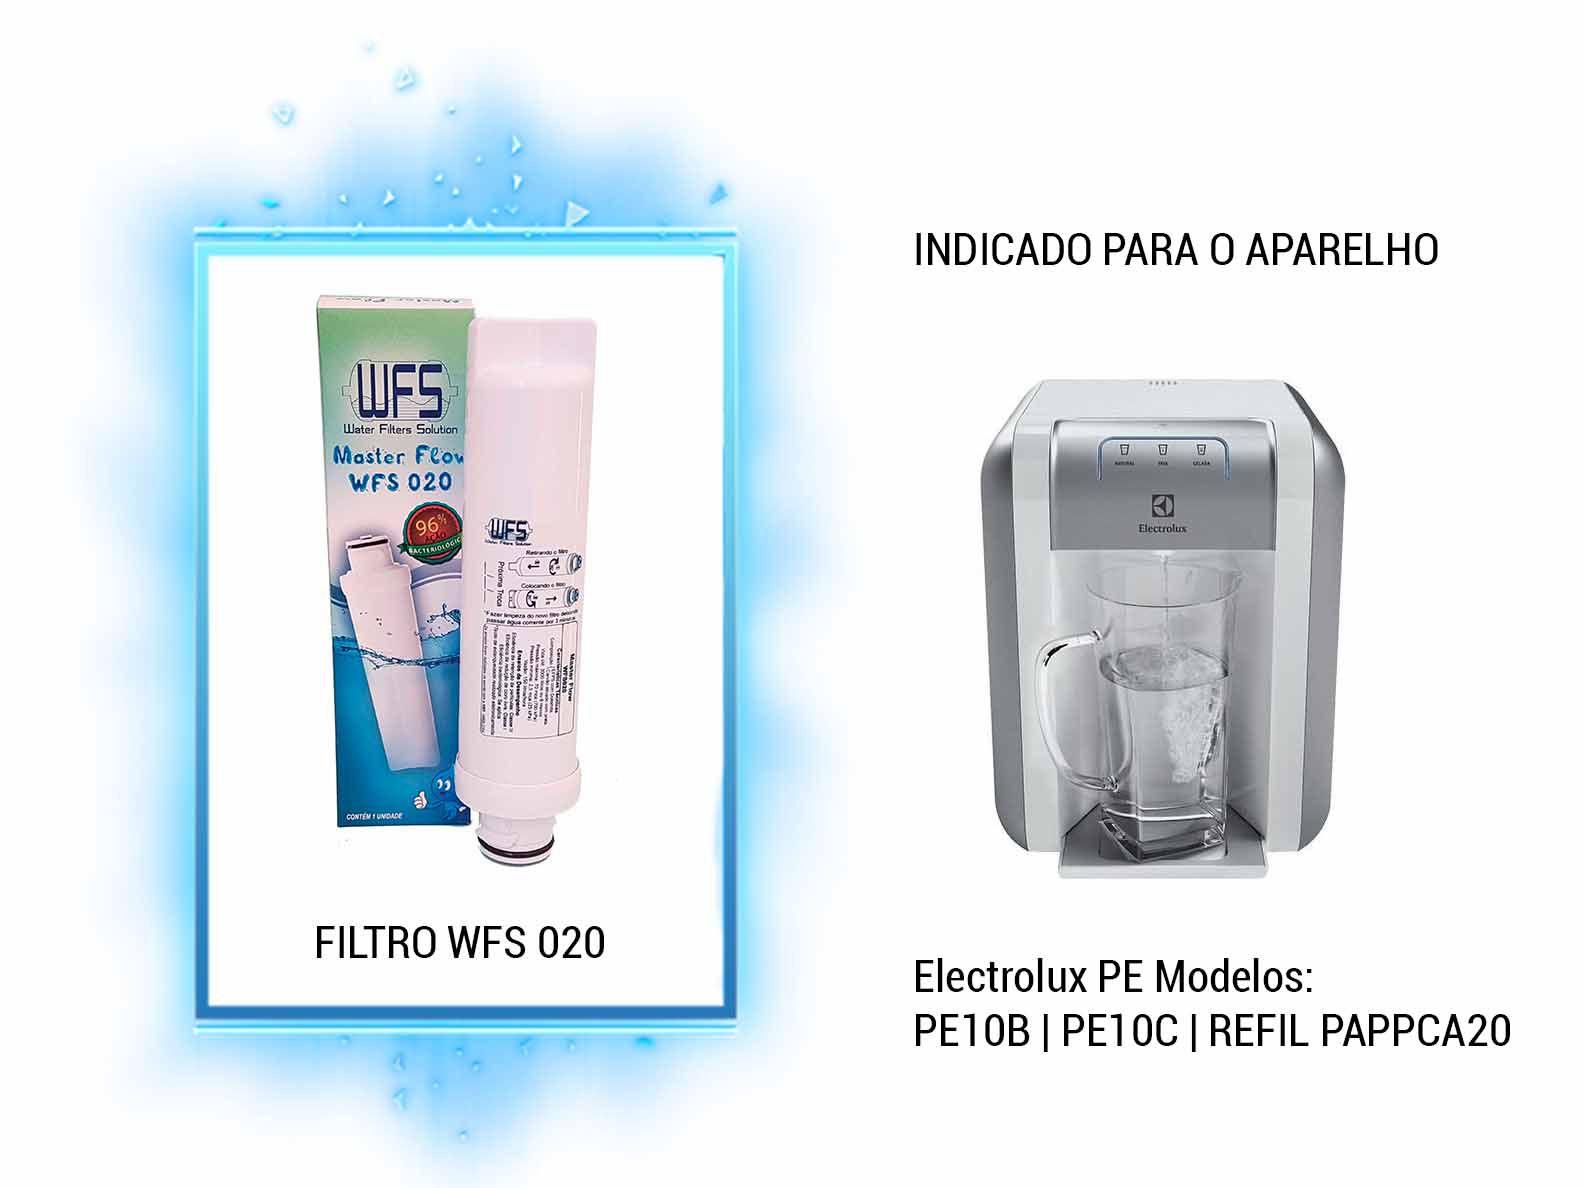 Refil Purificador Electrolux PE|  Wfs 020 |Master Flow